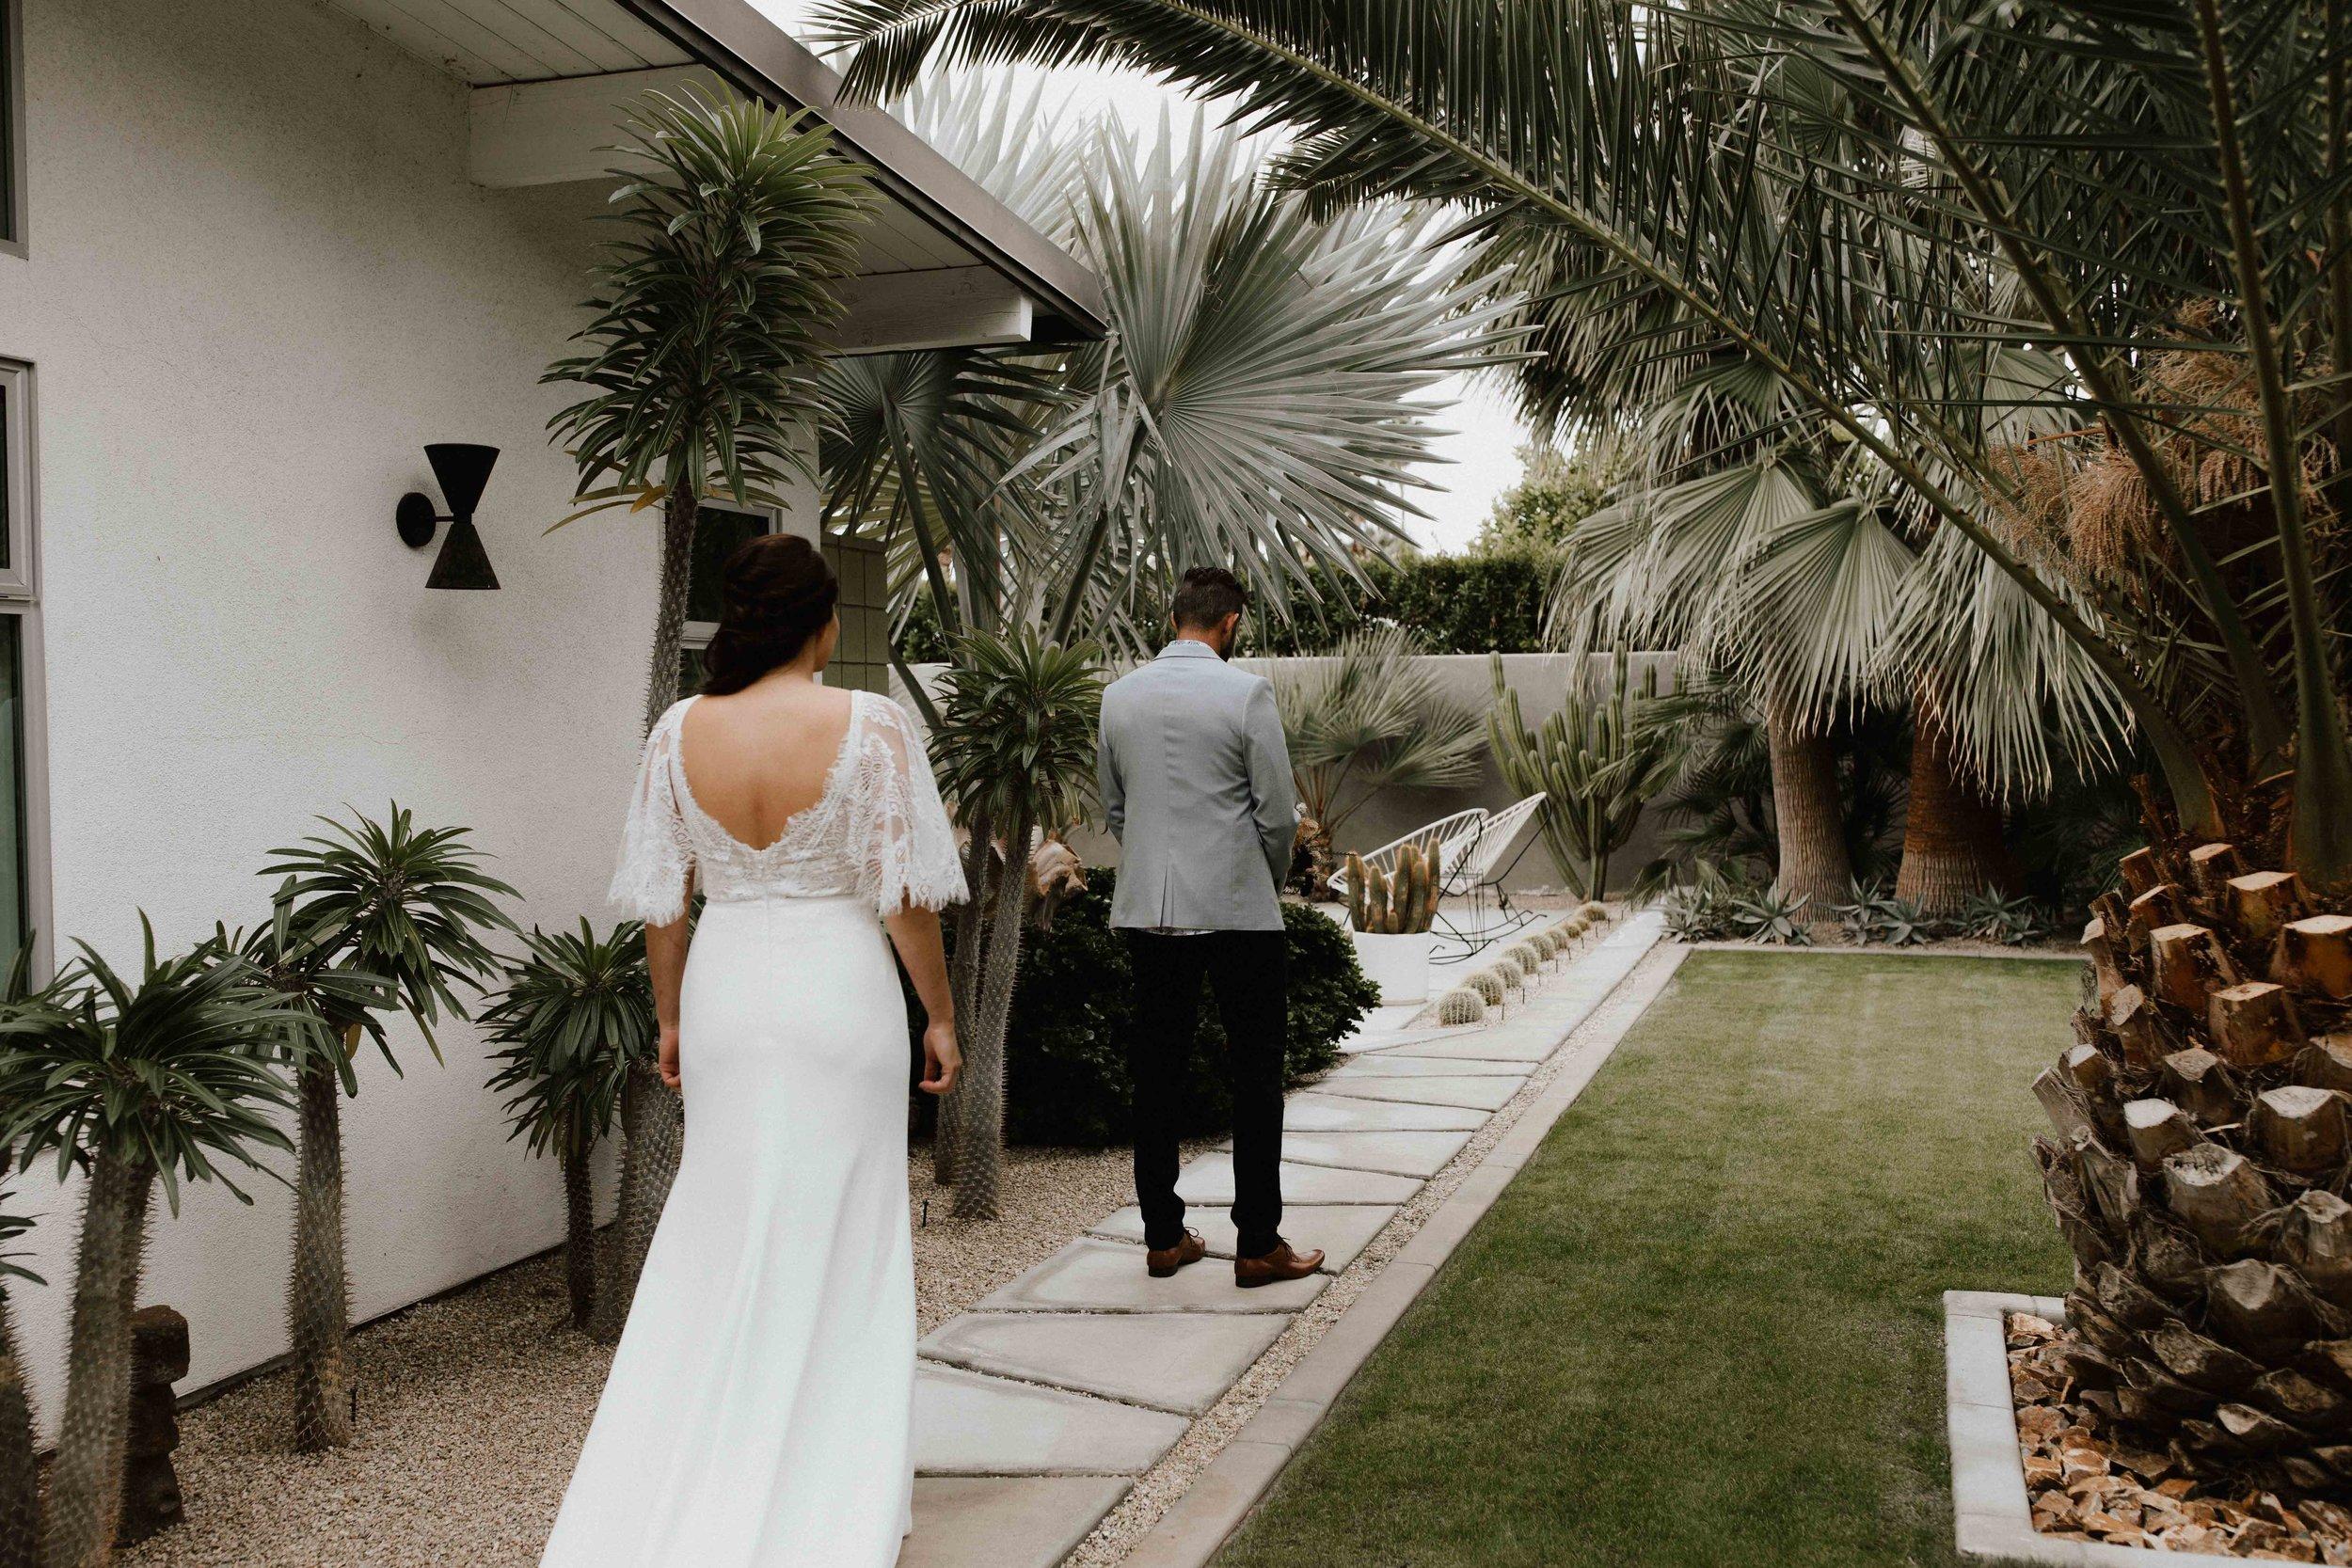 America Joshua Tree Palm Springs Elopement wedding-15.jpg